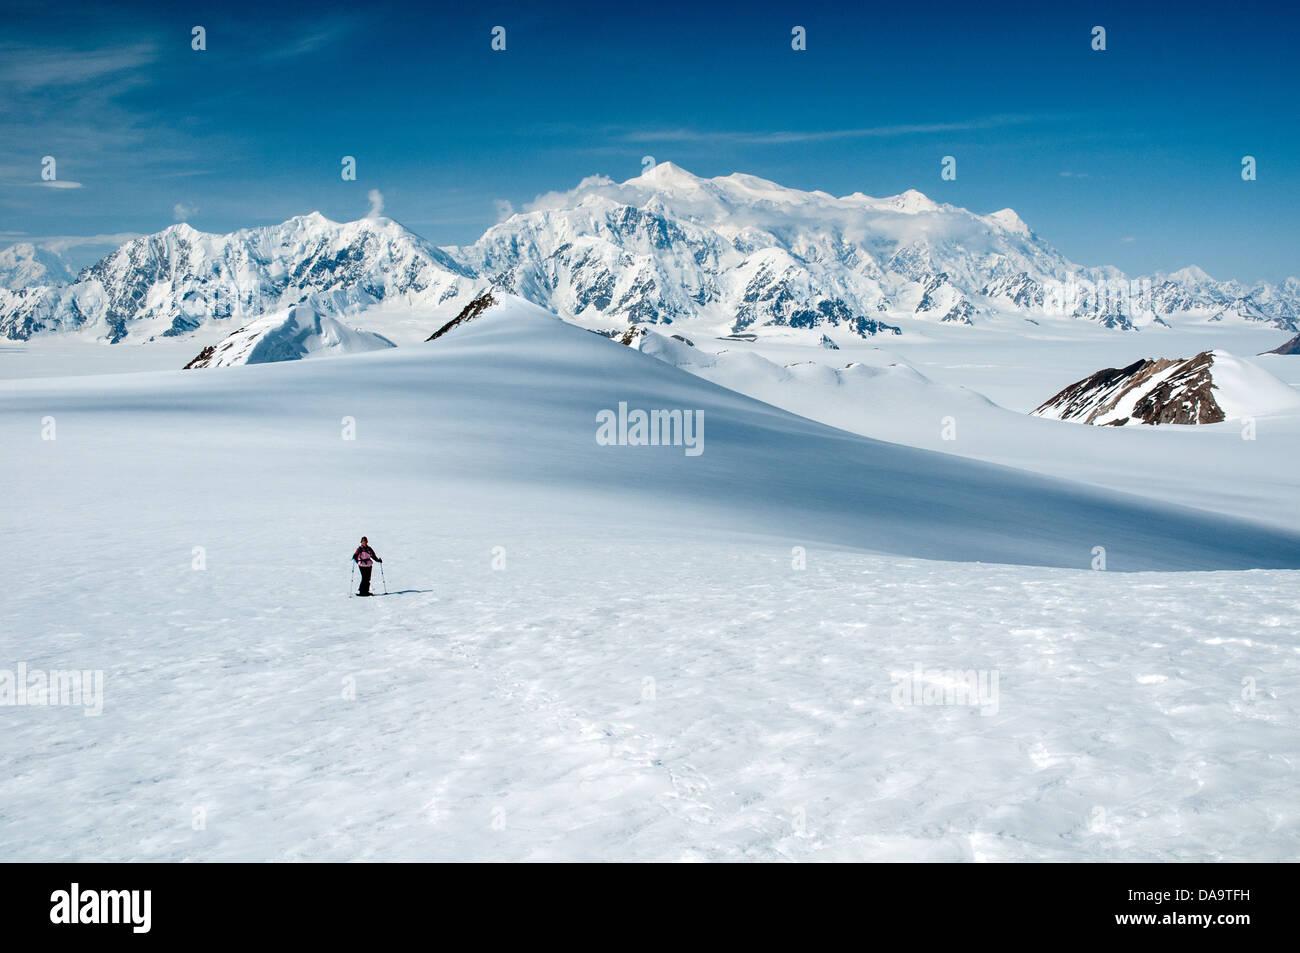 A snowshoer treks through Yukon's St. Elias Mountains, with Mount Logan, Canada's highest peak, in the background. - Stock Image